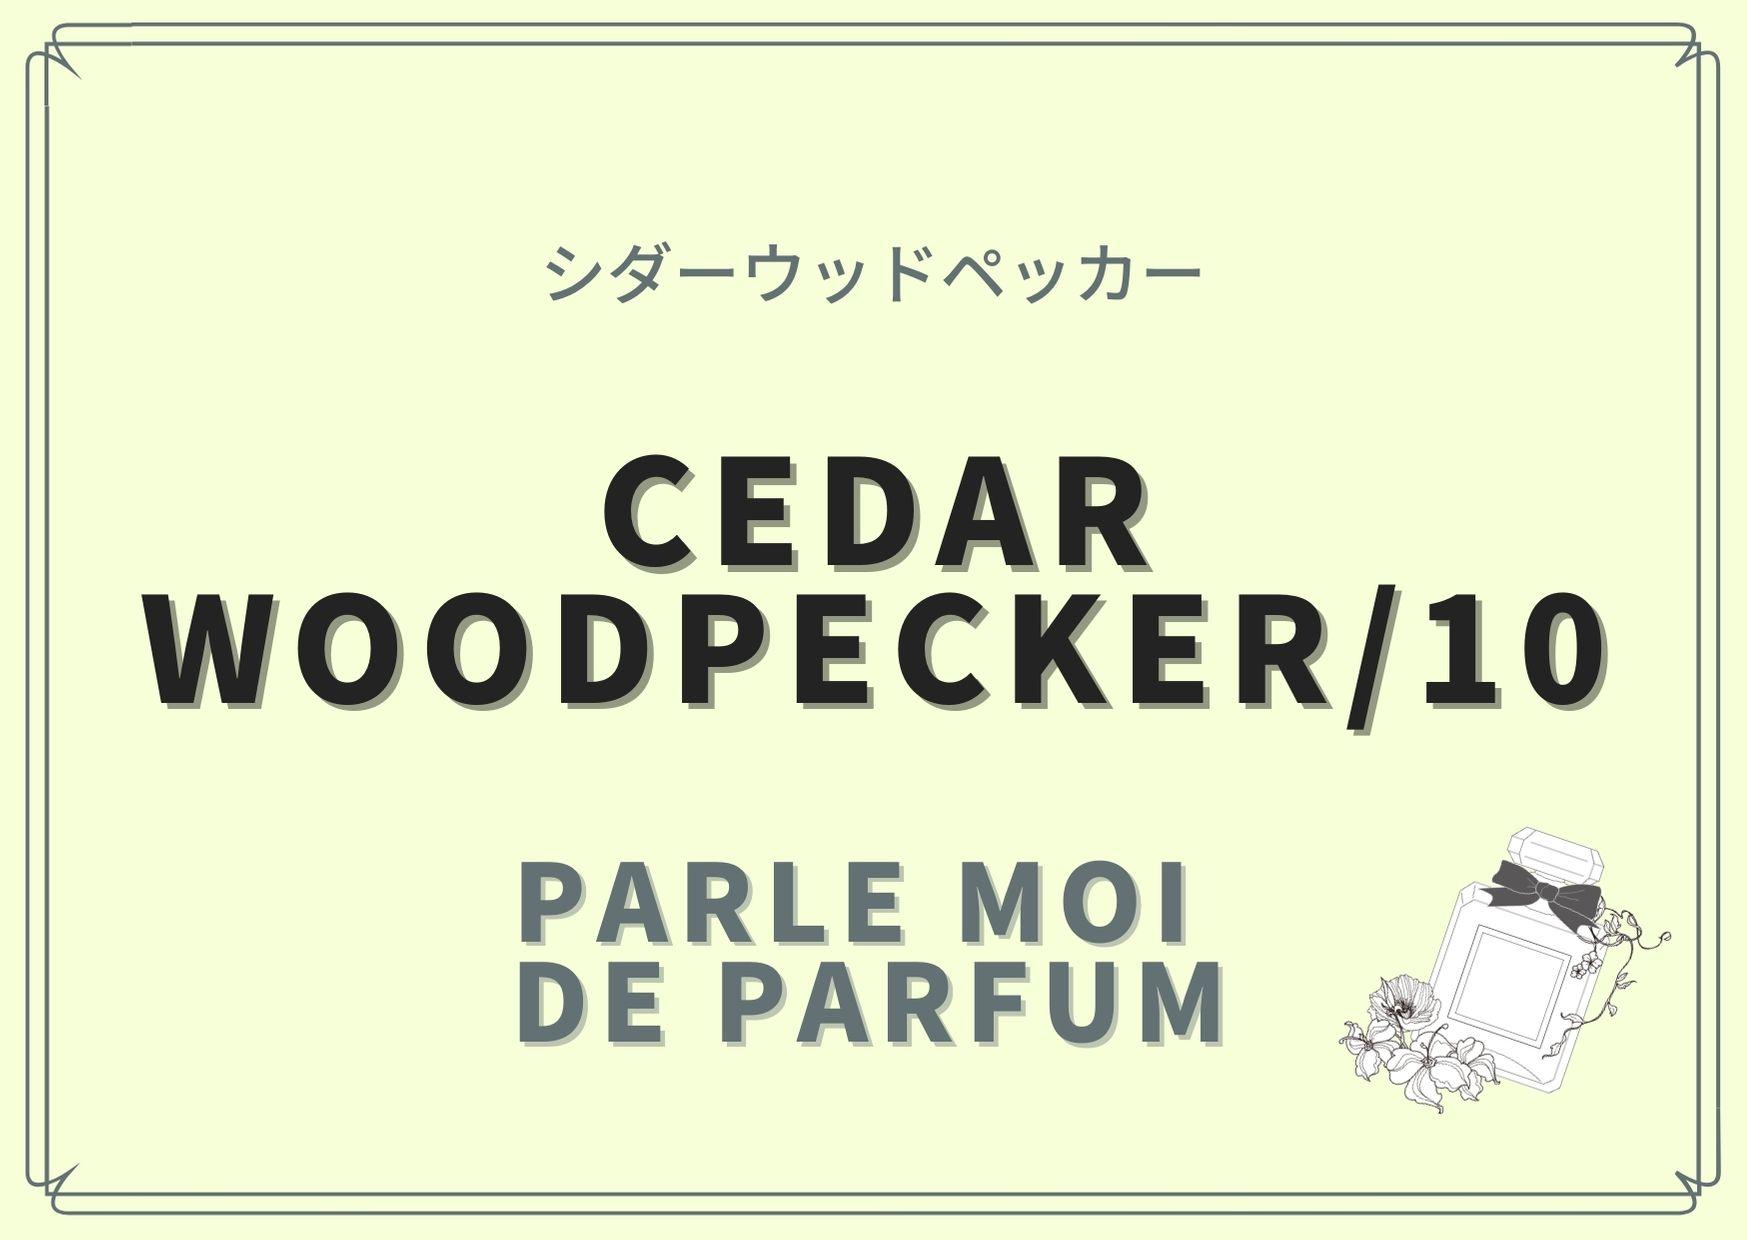 CEDAR WOODPECKER/10(シダーウッドペッカー )/PARLE MOI DE PARFUM(パルル モア ドゥ パルファム)